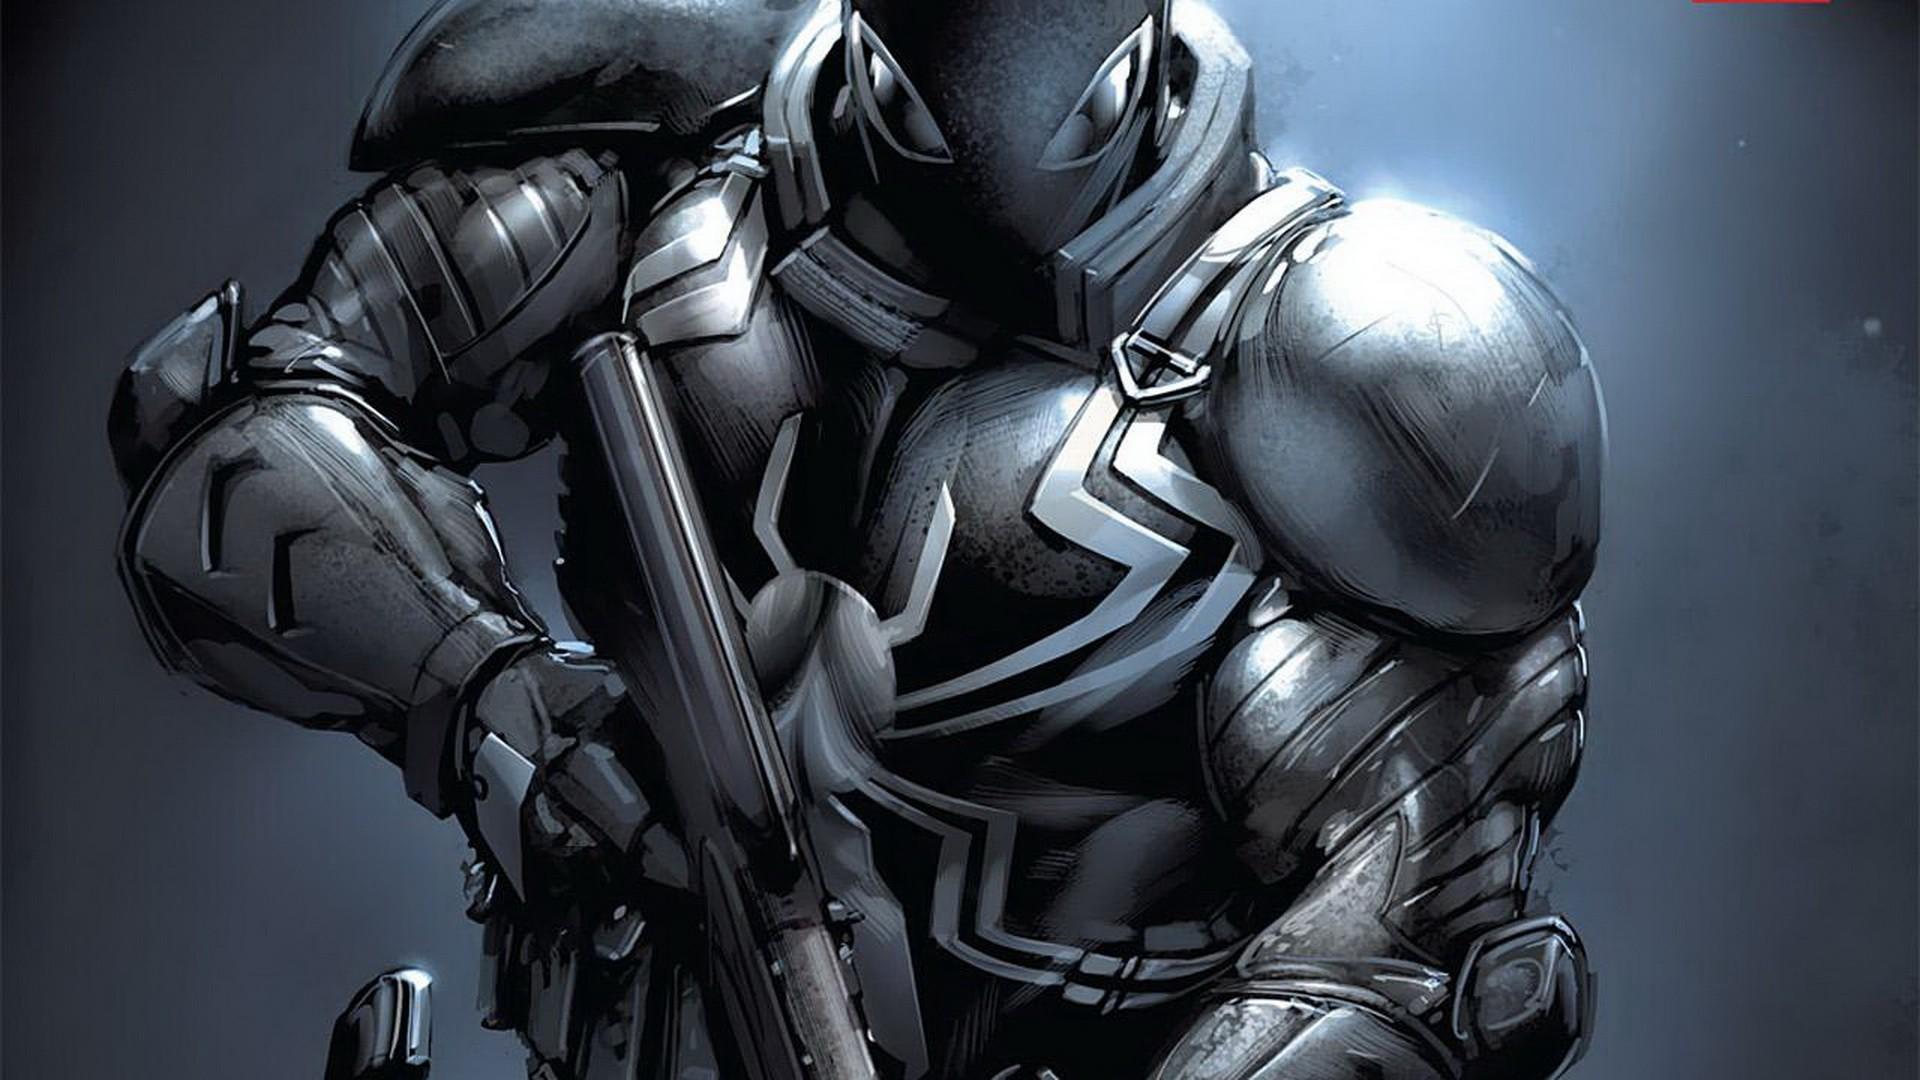 Anti Venom Marvel Wallpaper Agent venom 1920x1080